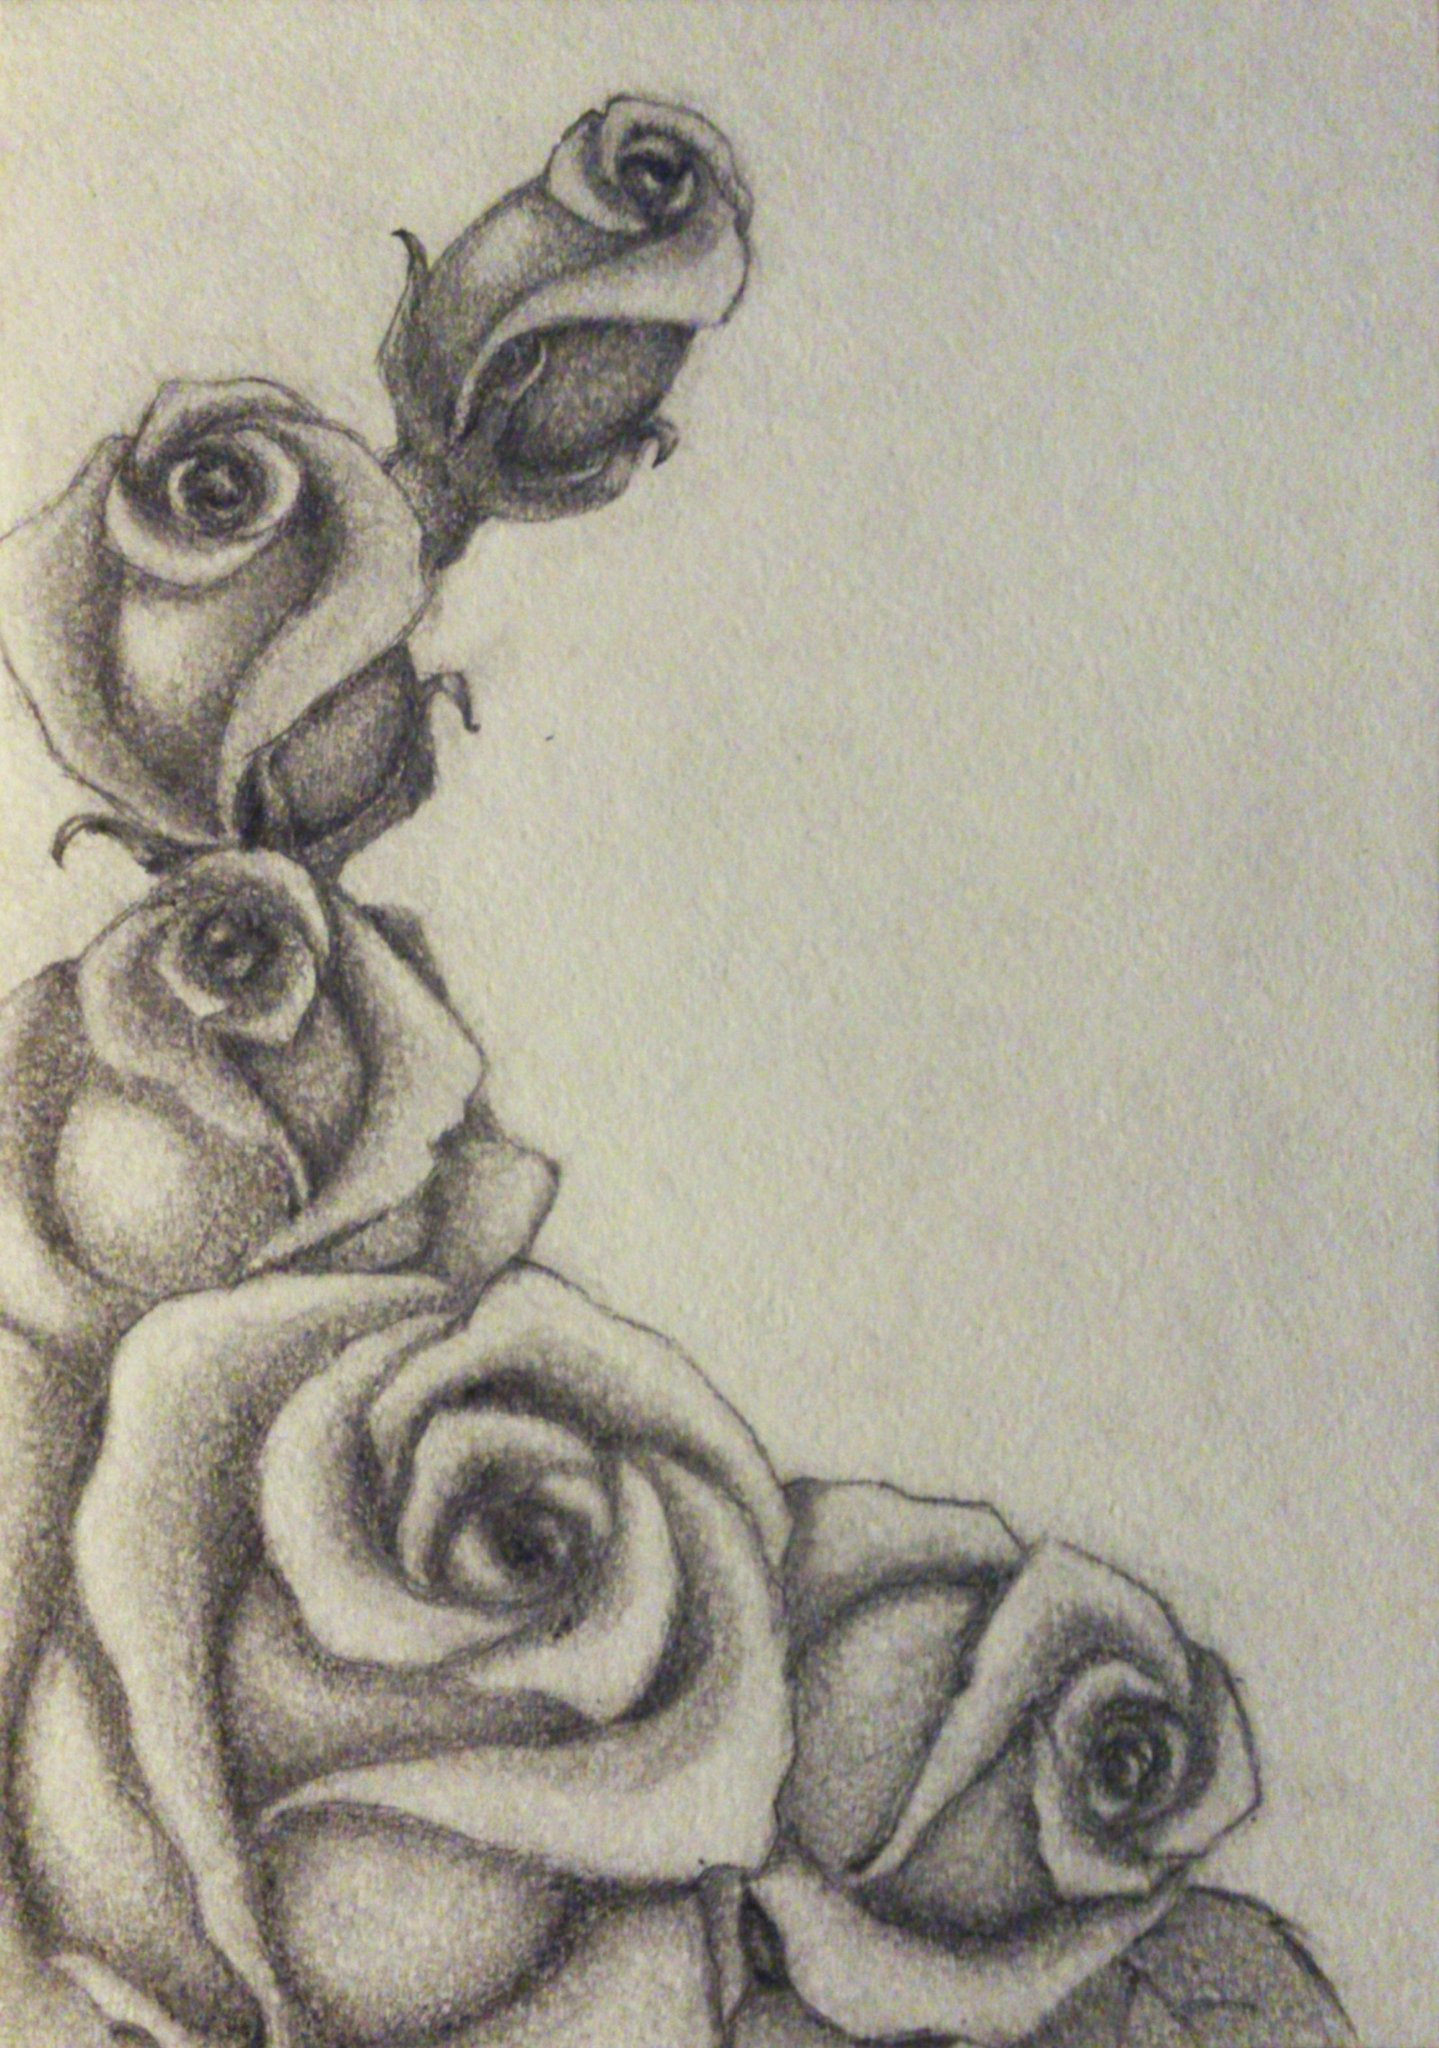 Картинки с розами нарисованные, картинки магистр